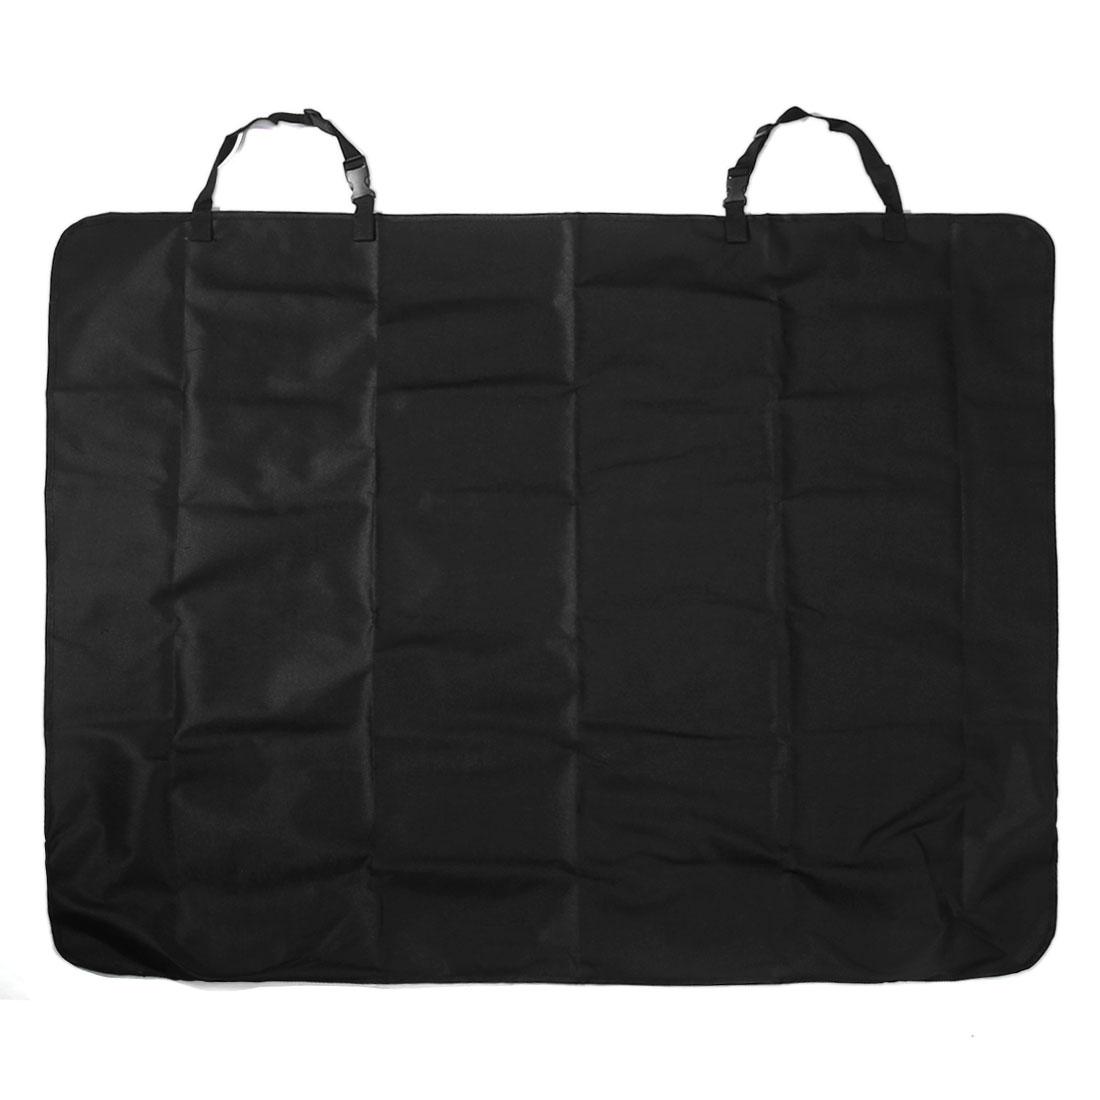 Black Waterproof Car Dog Cat Pet Rear Seat Cover Protector Mat Blanket 126cm x 100cm